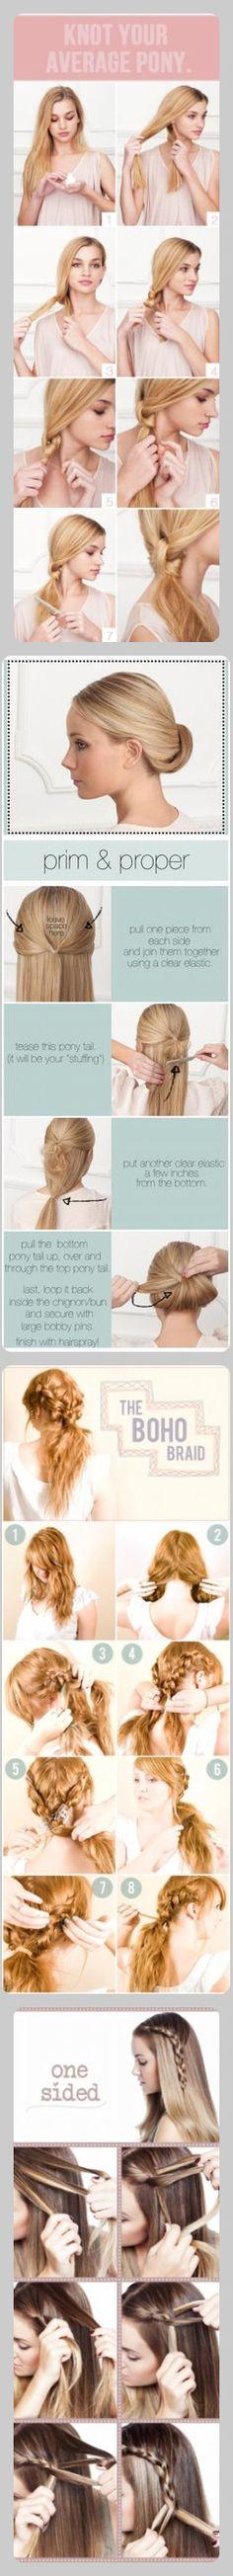 cool hair style DIYs :)